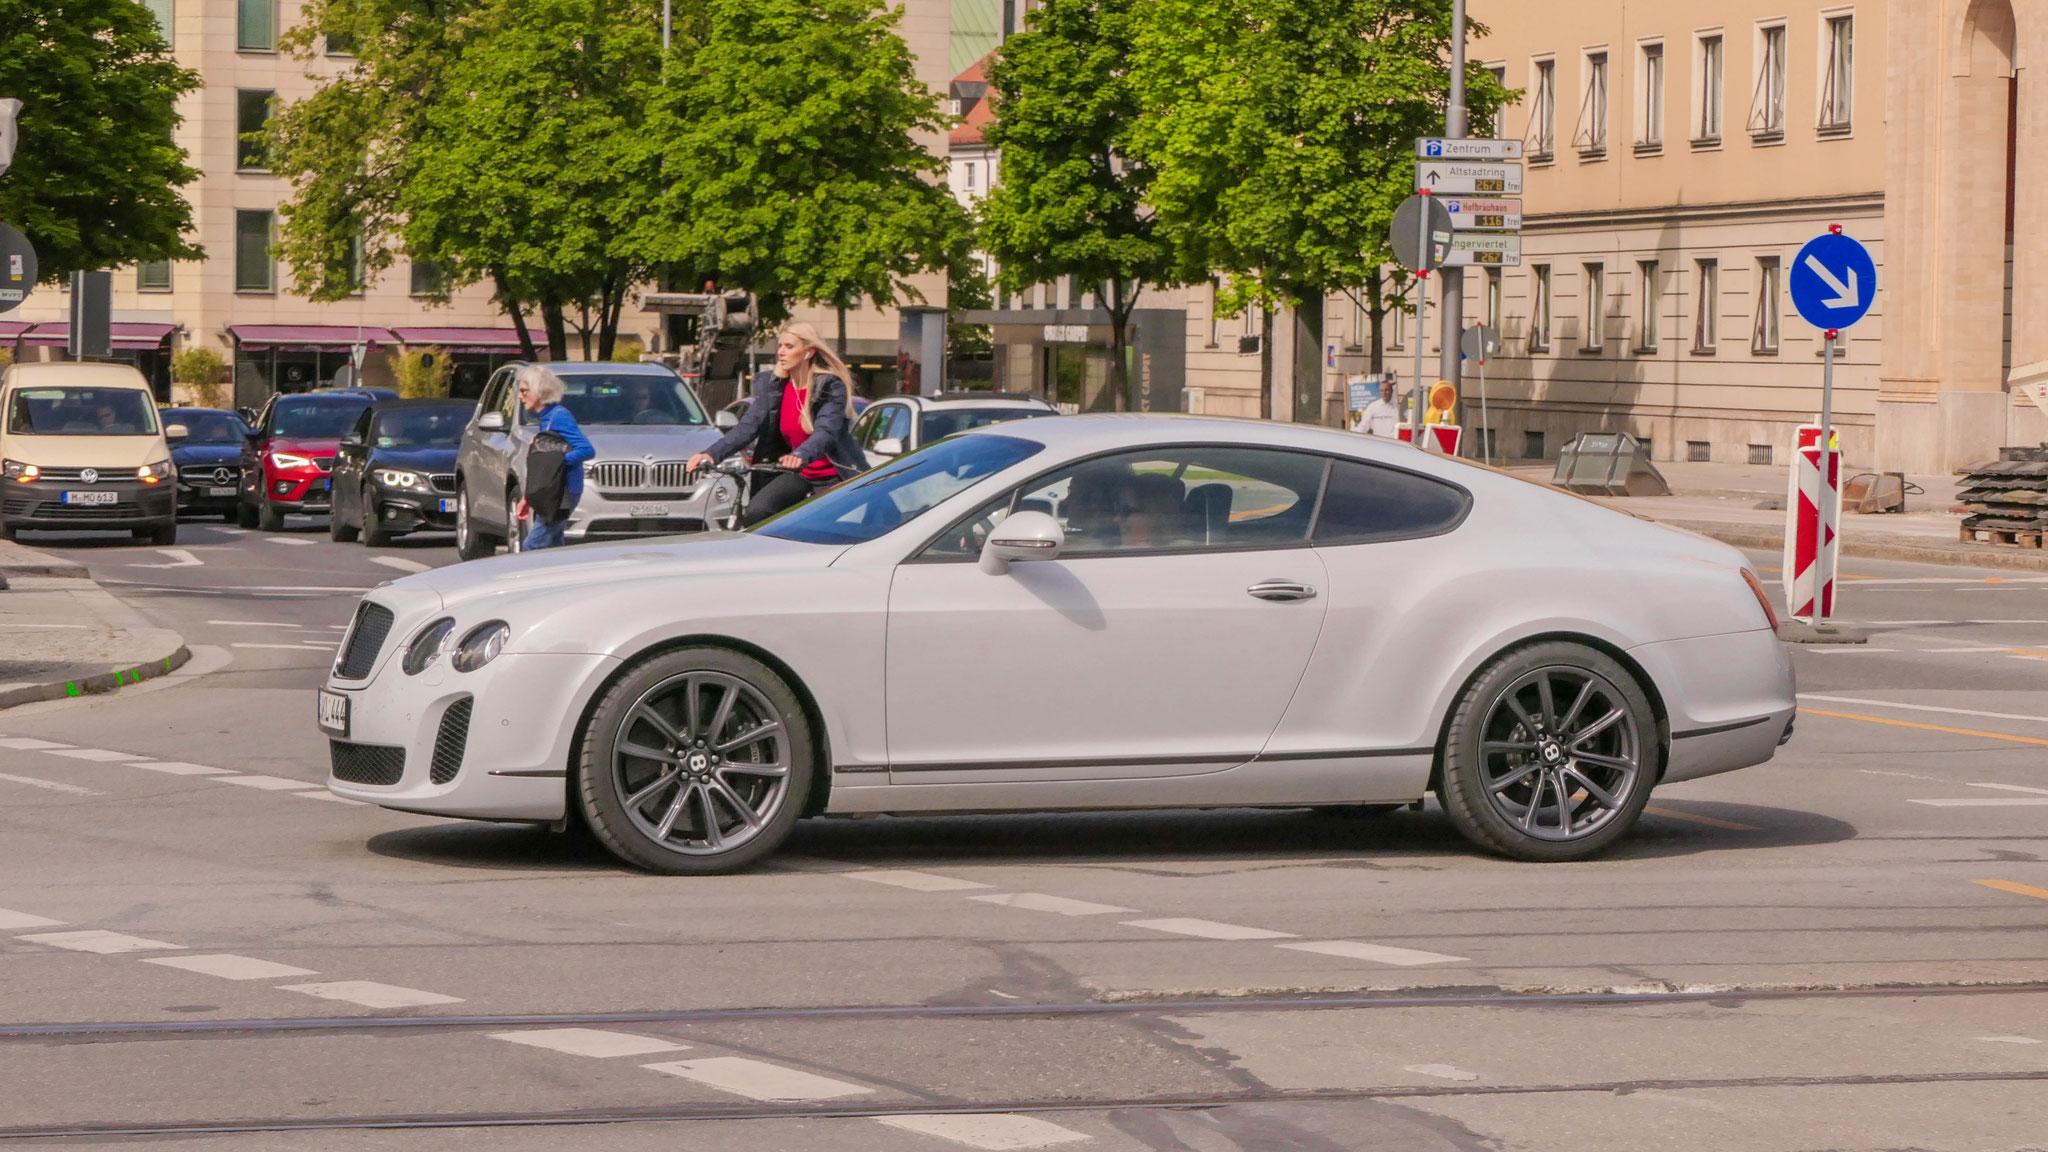 Bentley Continental GT Supersports - GS-KL-444